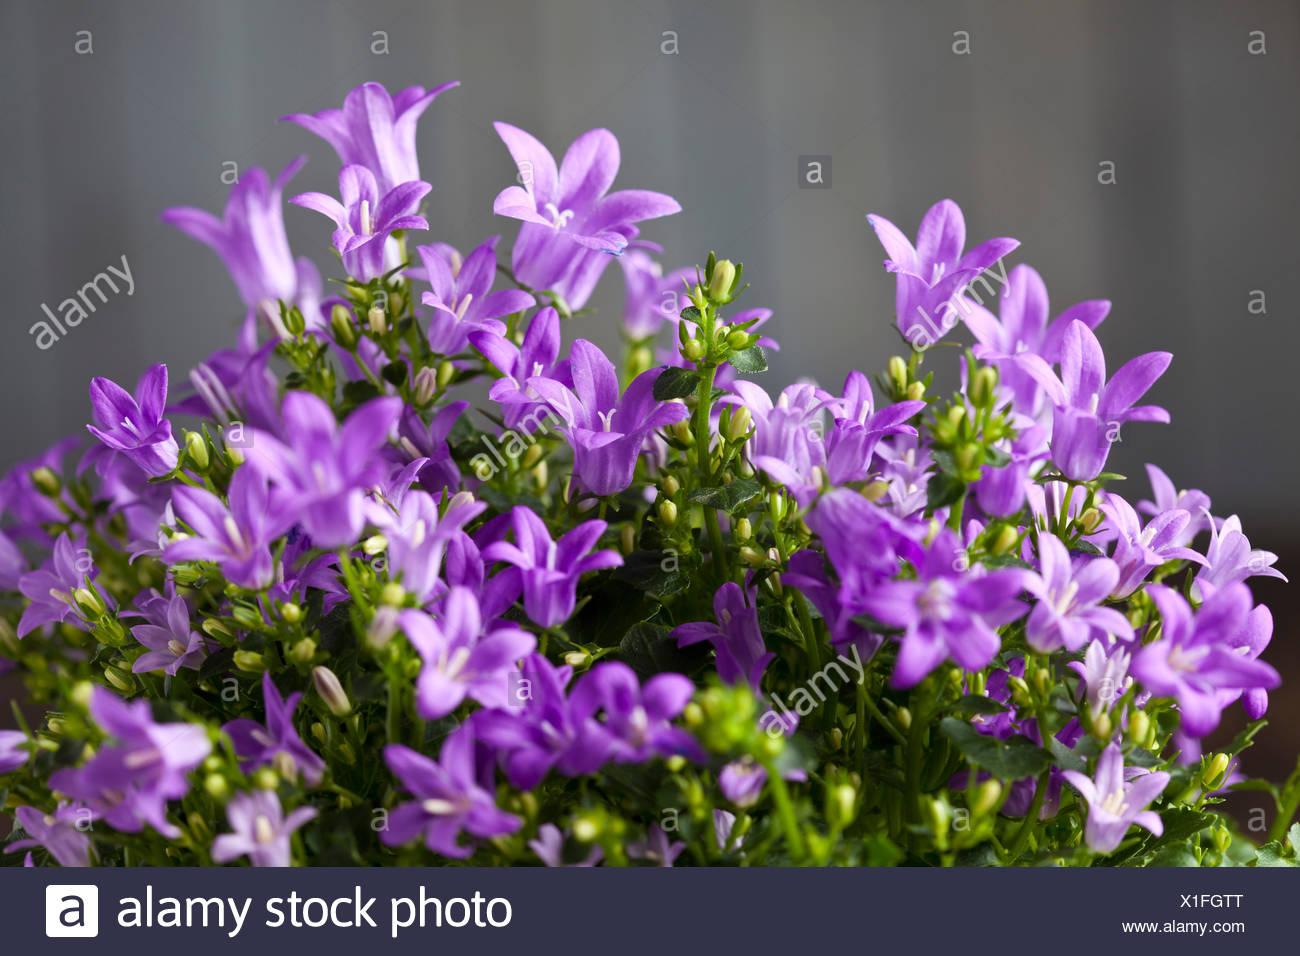 Purple Bellflowers Close Up Stock Photo 276323064 Alamy